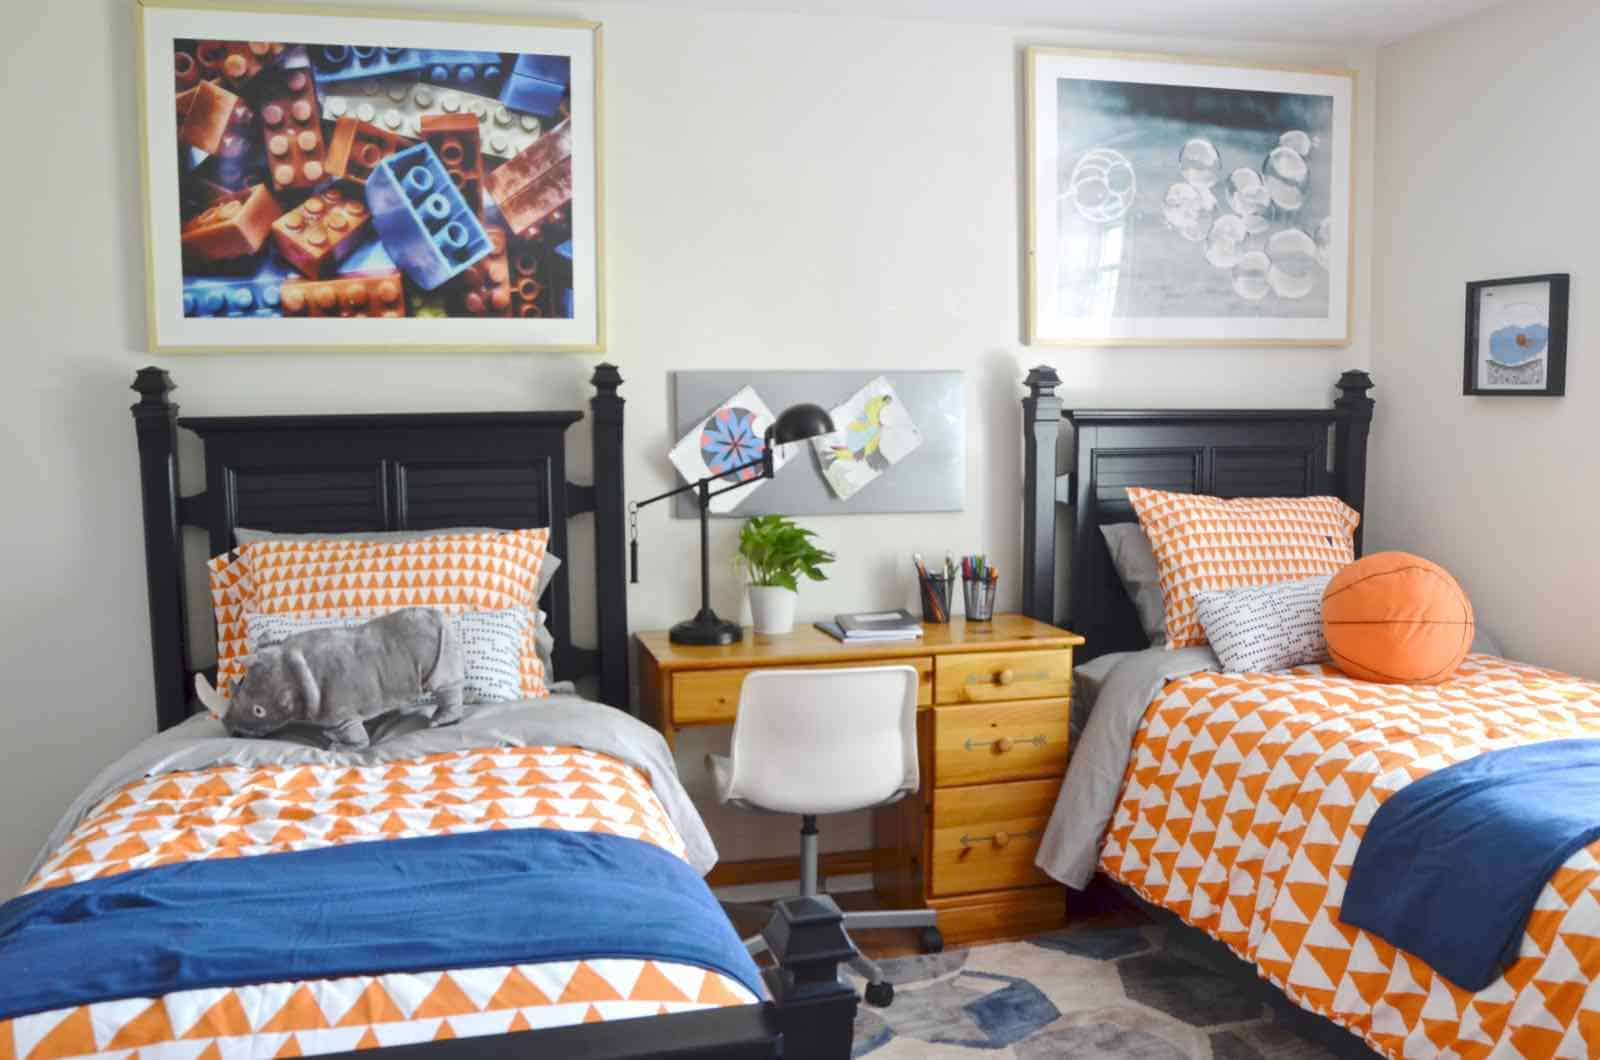 Shared boys room habitat